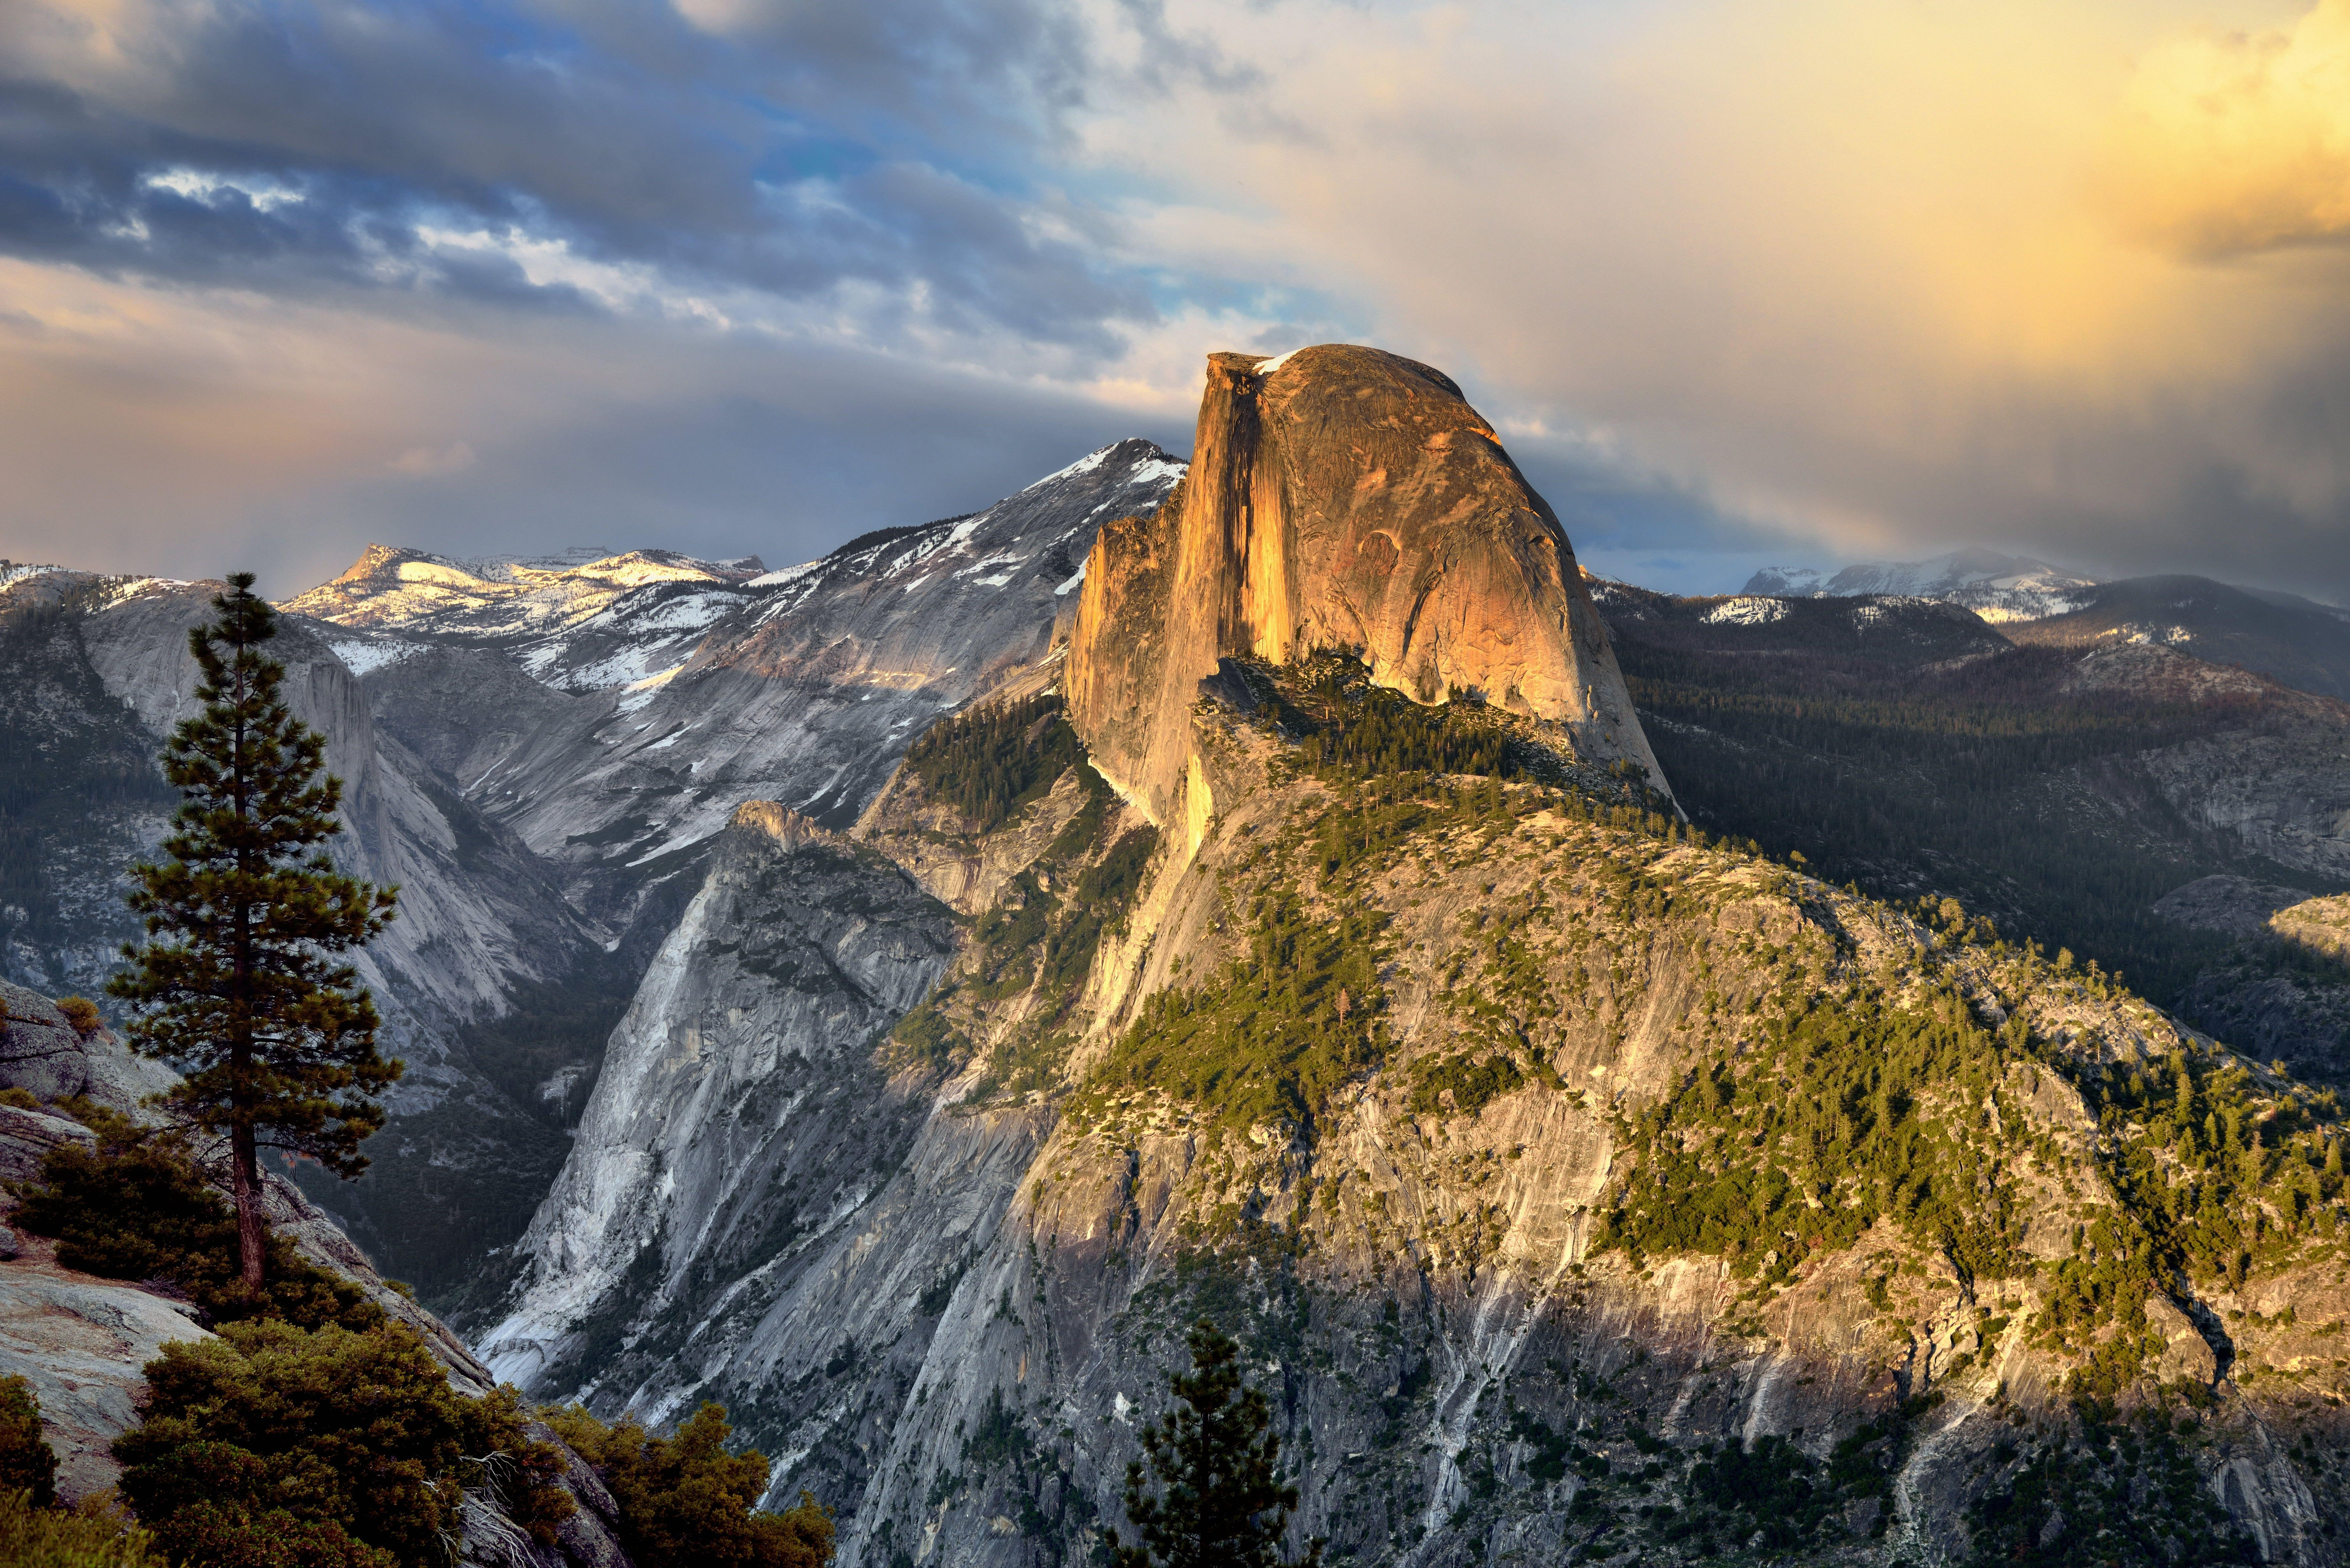 Yosemite National Park HD Wallpapers - Wallpaper Cave